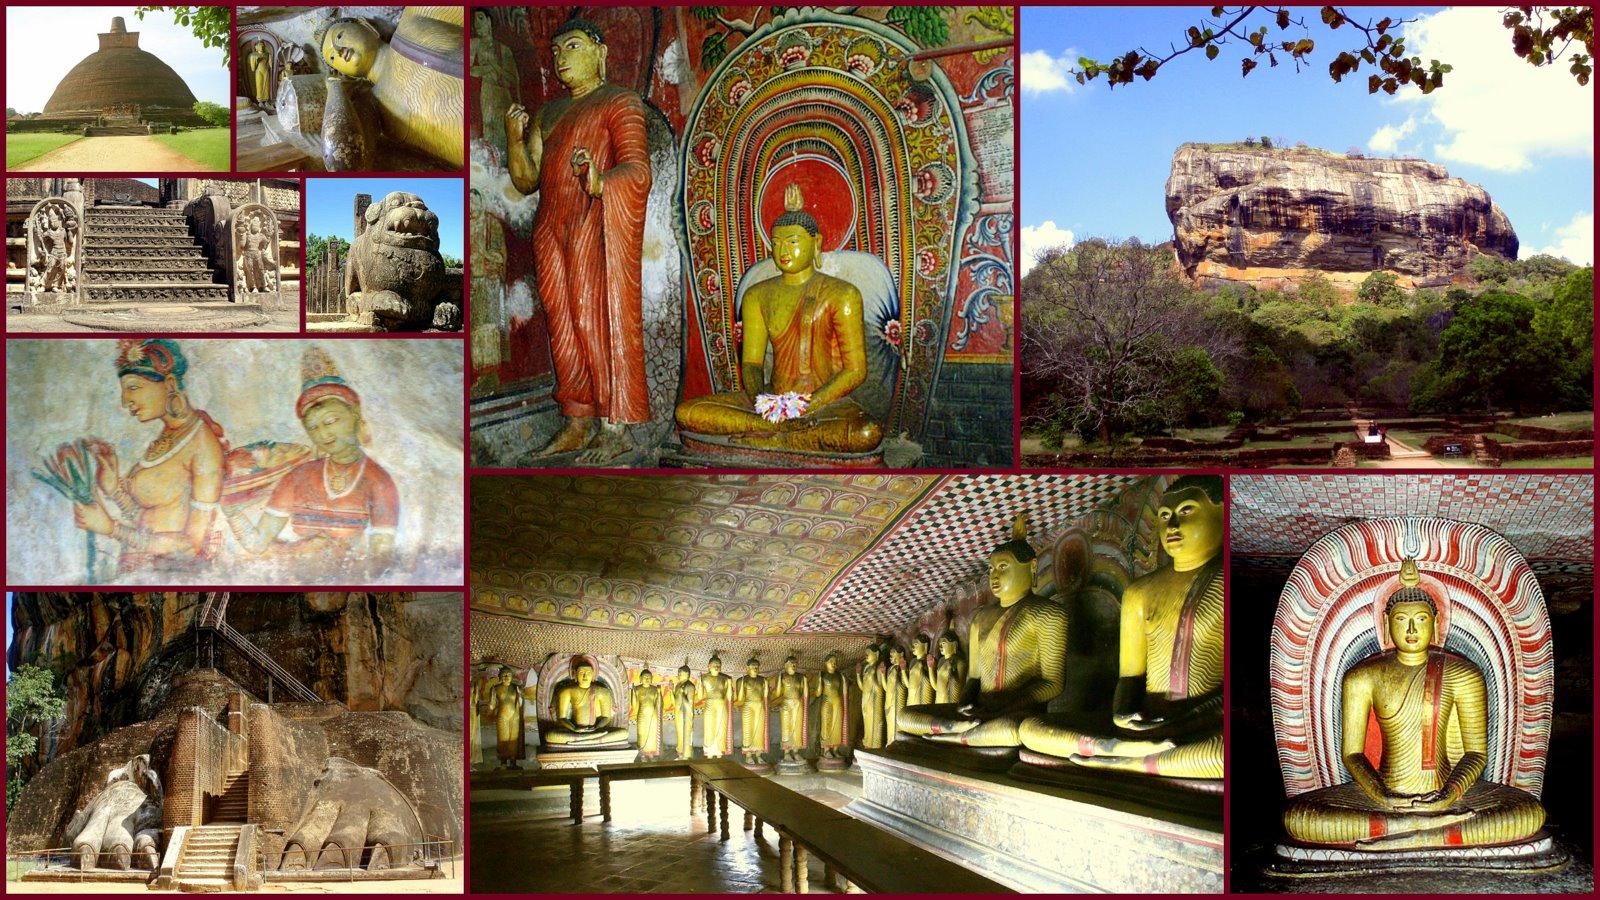 Tourism in gujarat essay